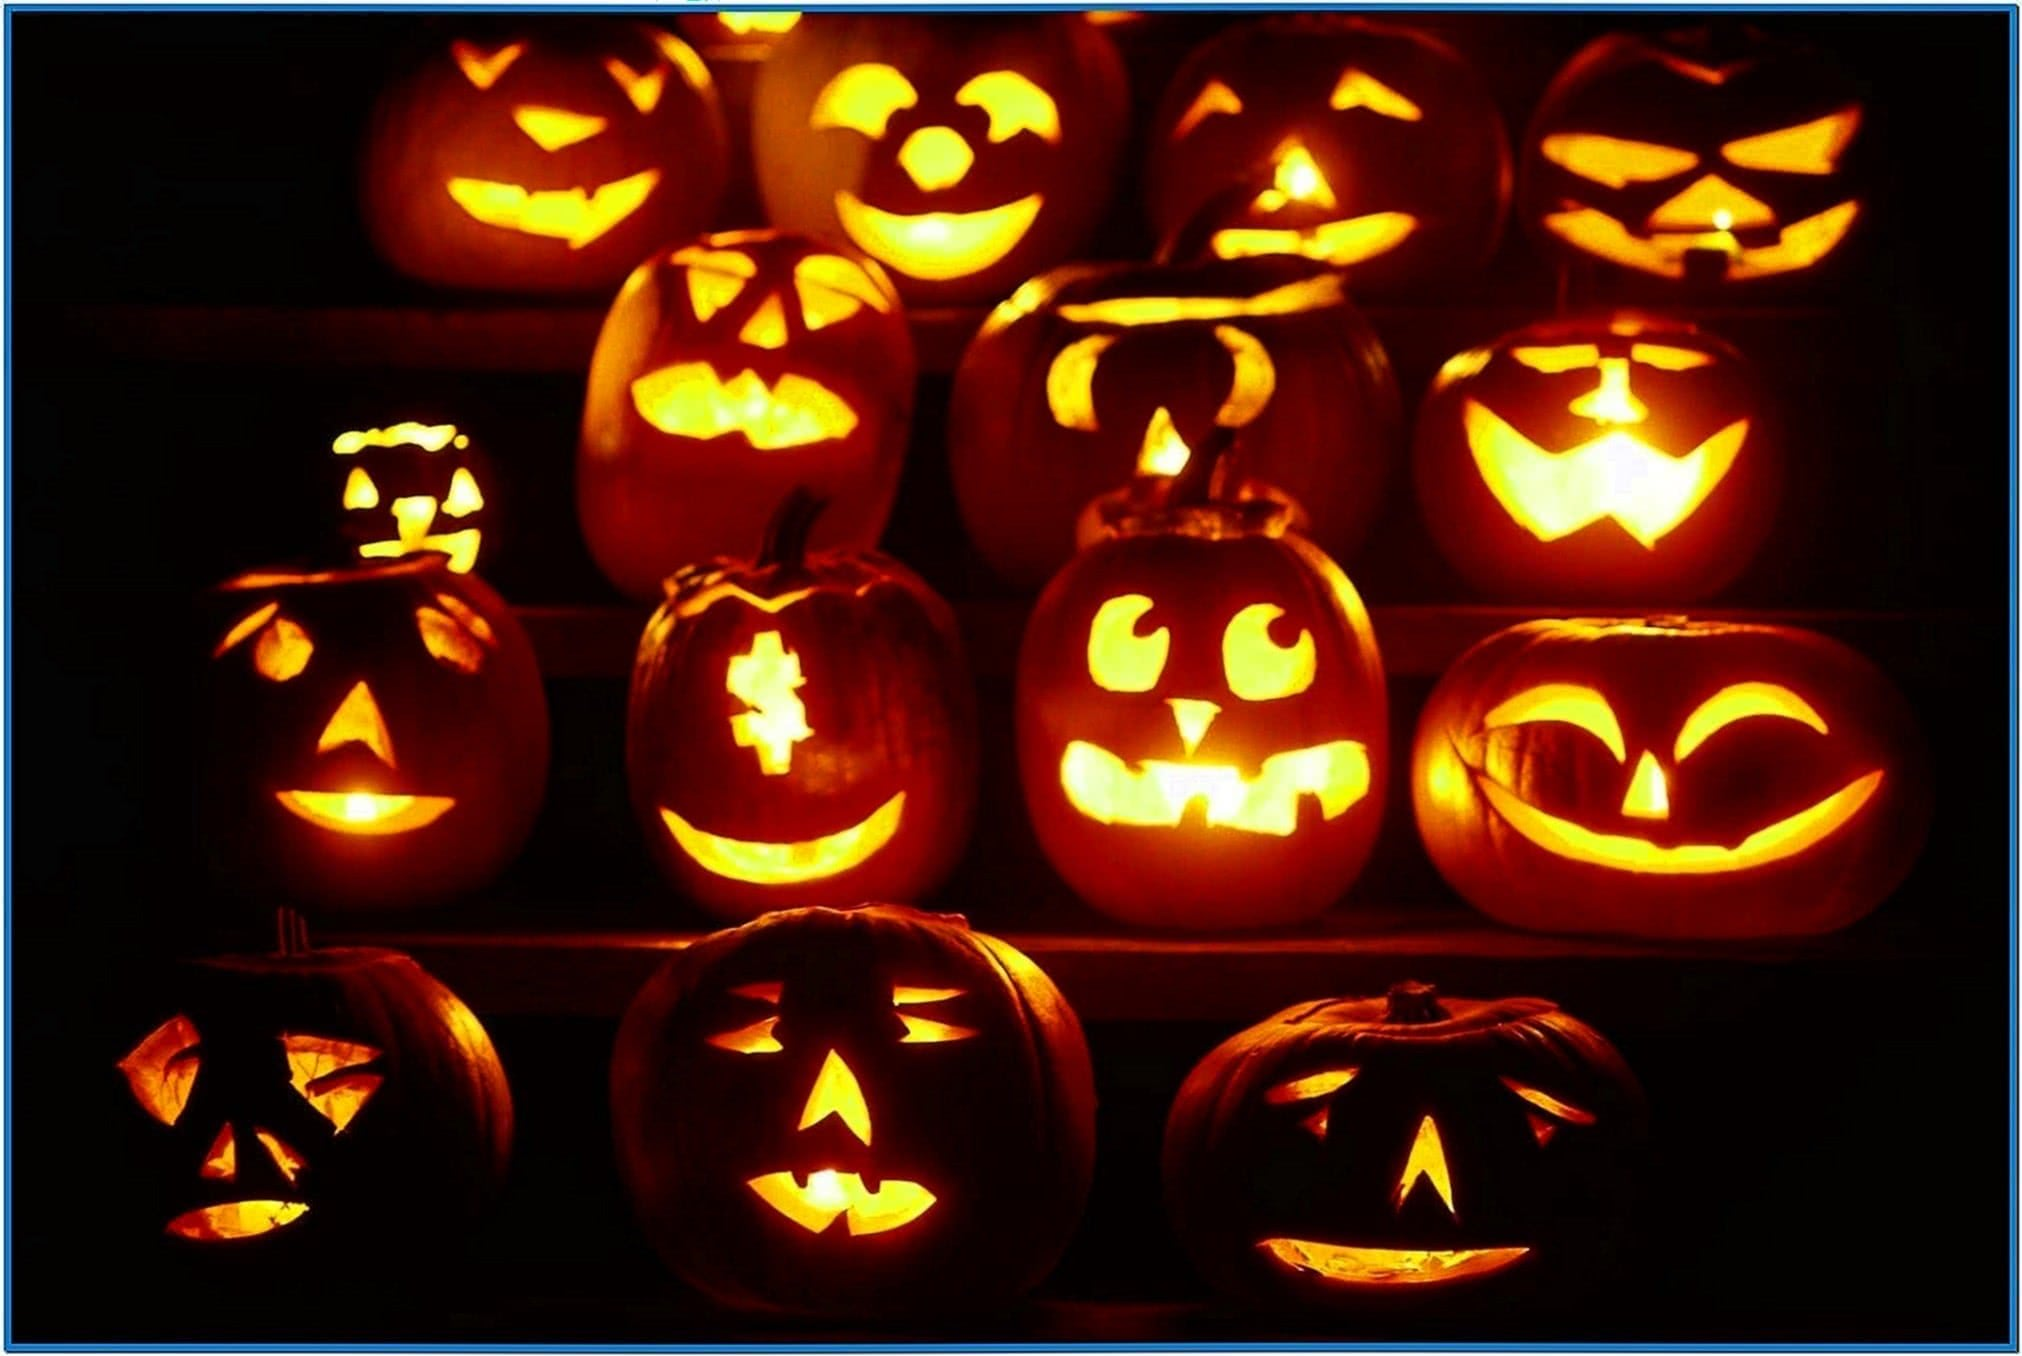 Pumpkin screensaver